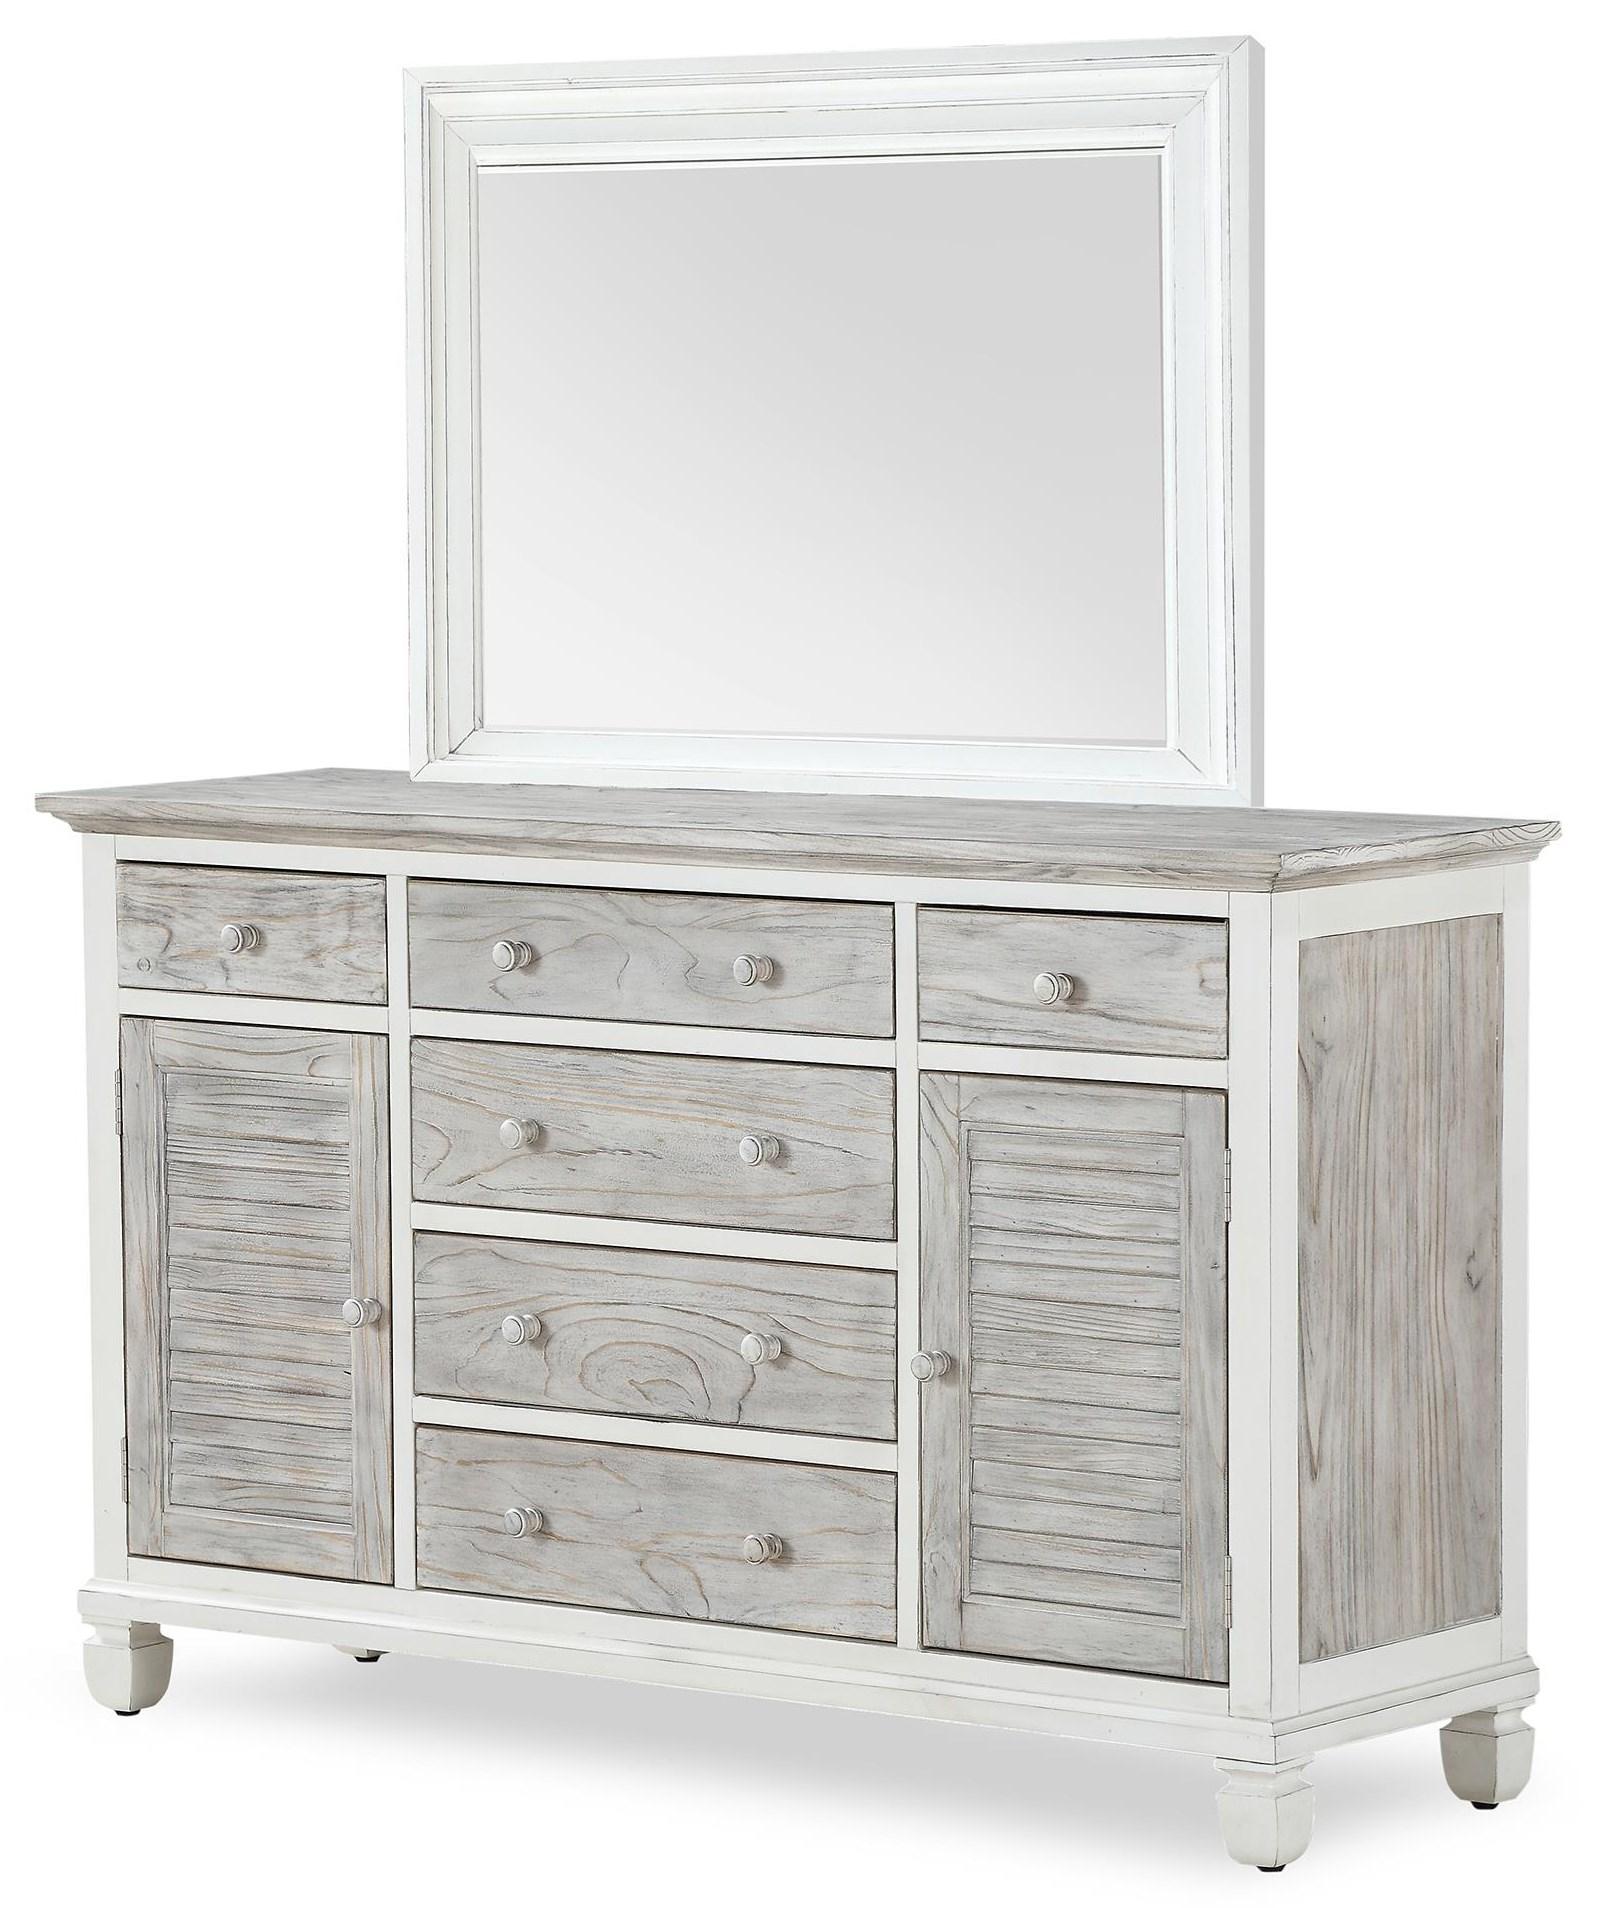 islamorada Dresser and Mirror by Sea Winds Trading Company at Johnny Janosik